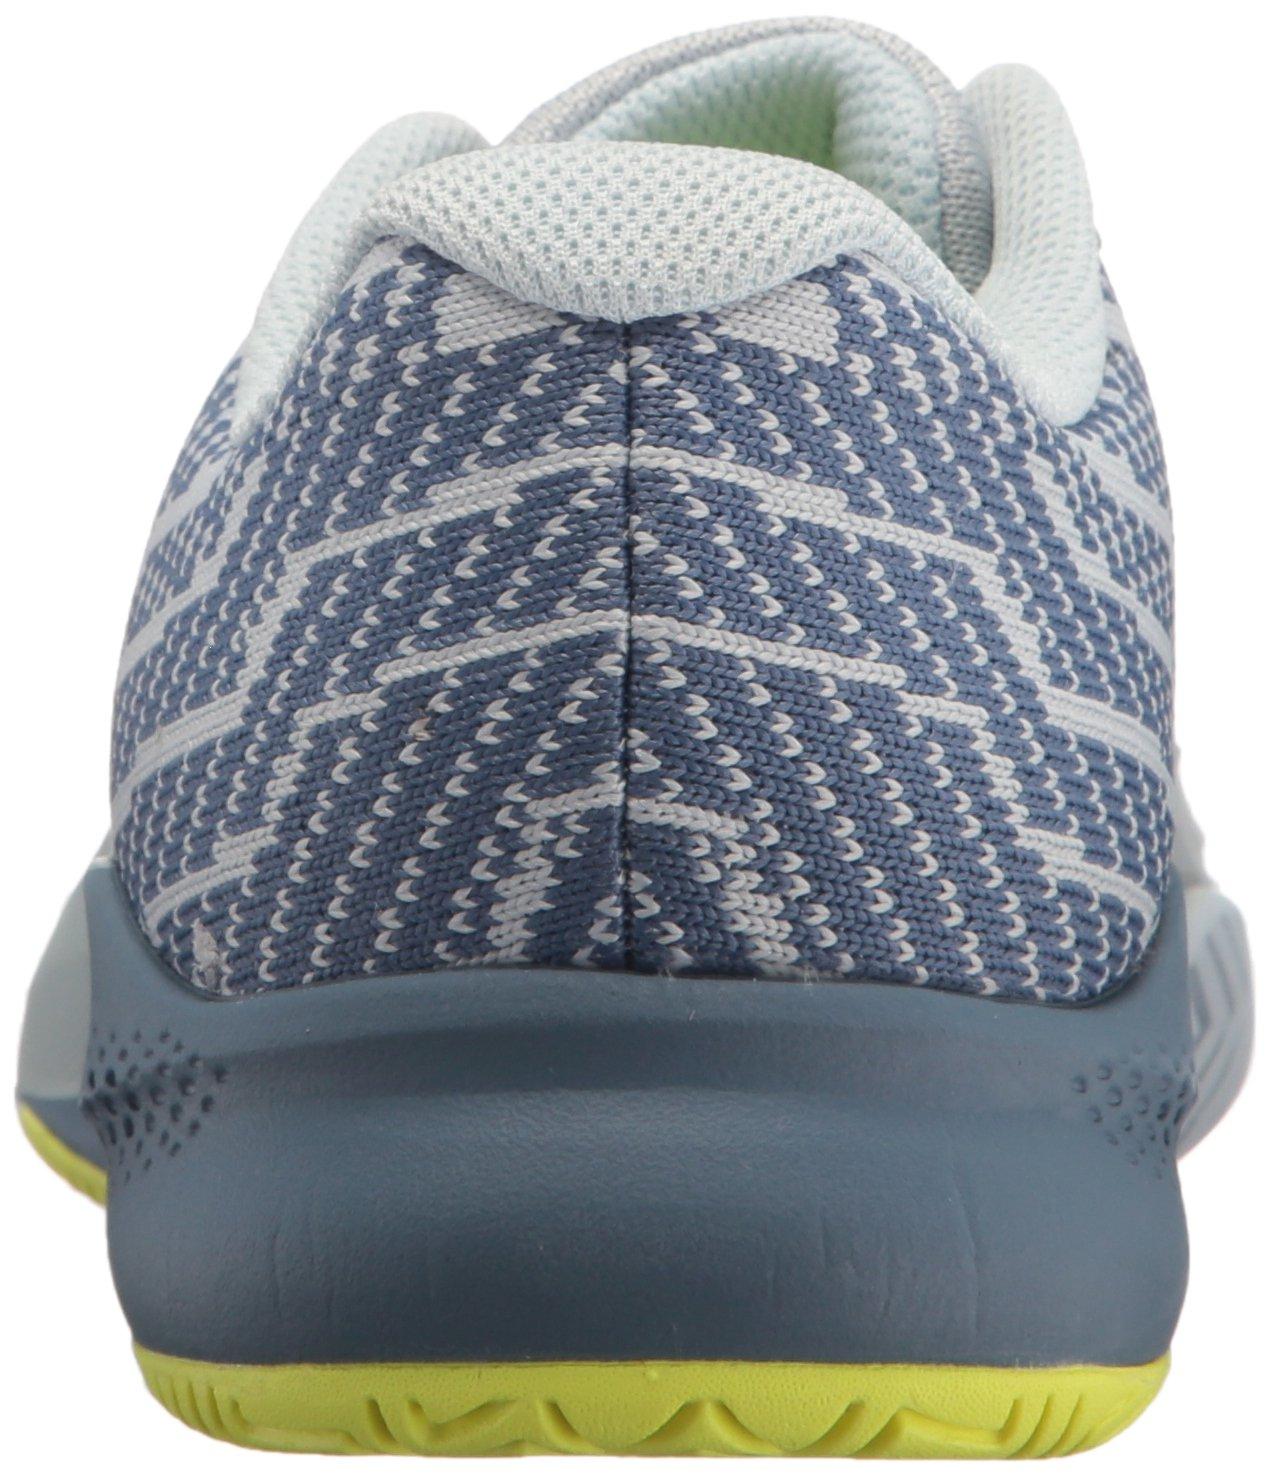 New Balance Women's 996v3 Hard Court Tennis Shoe B06XSG4MD6 55 D US|Light Porcelain Blue/Solar Yellow